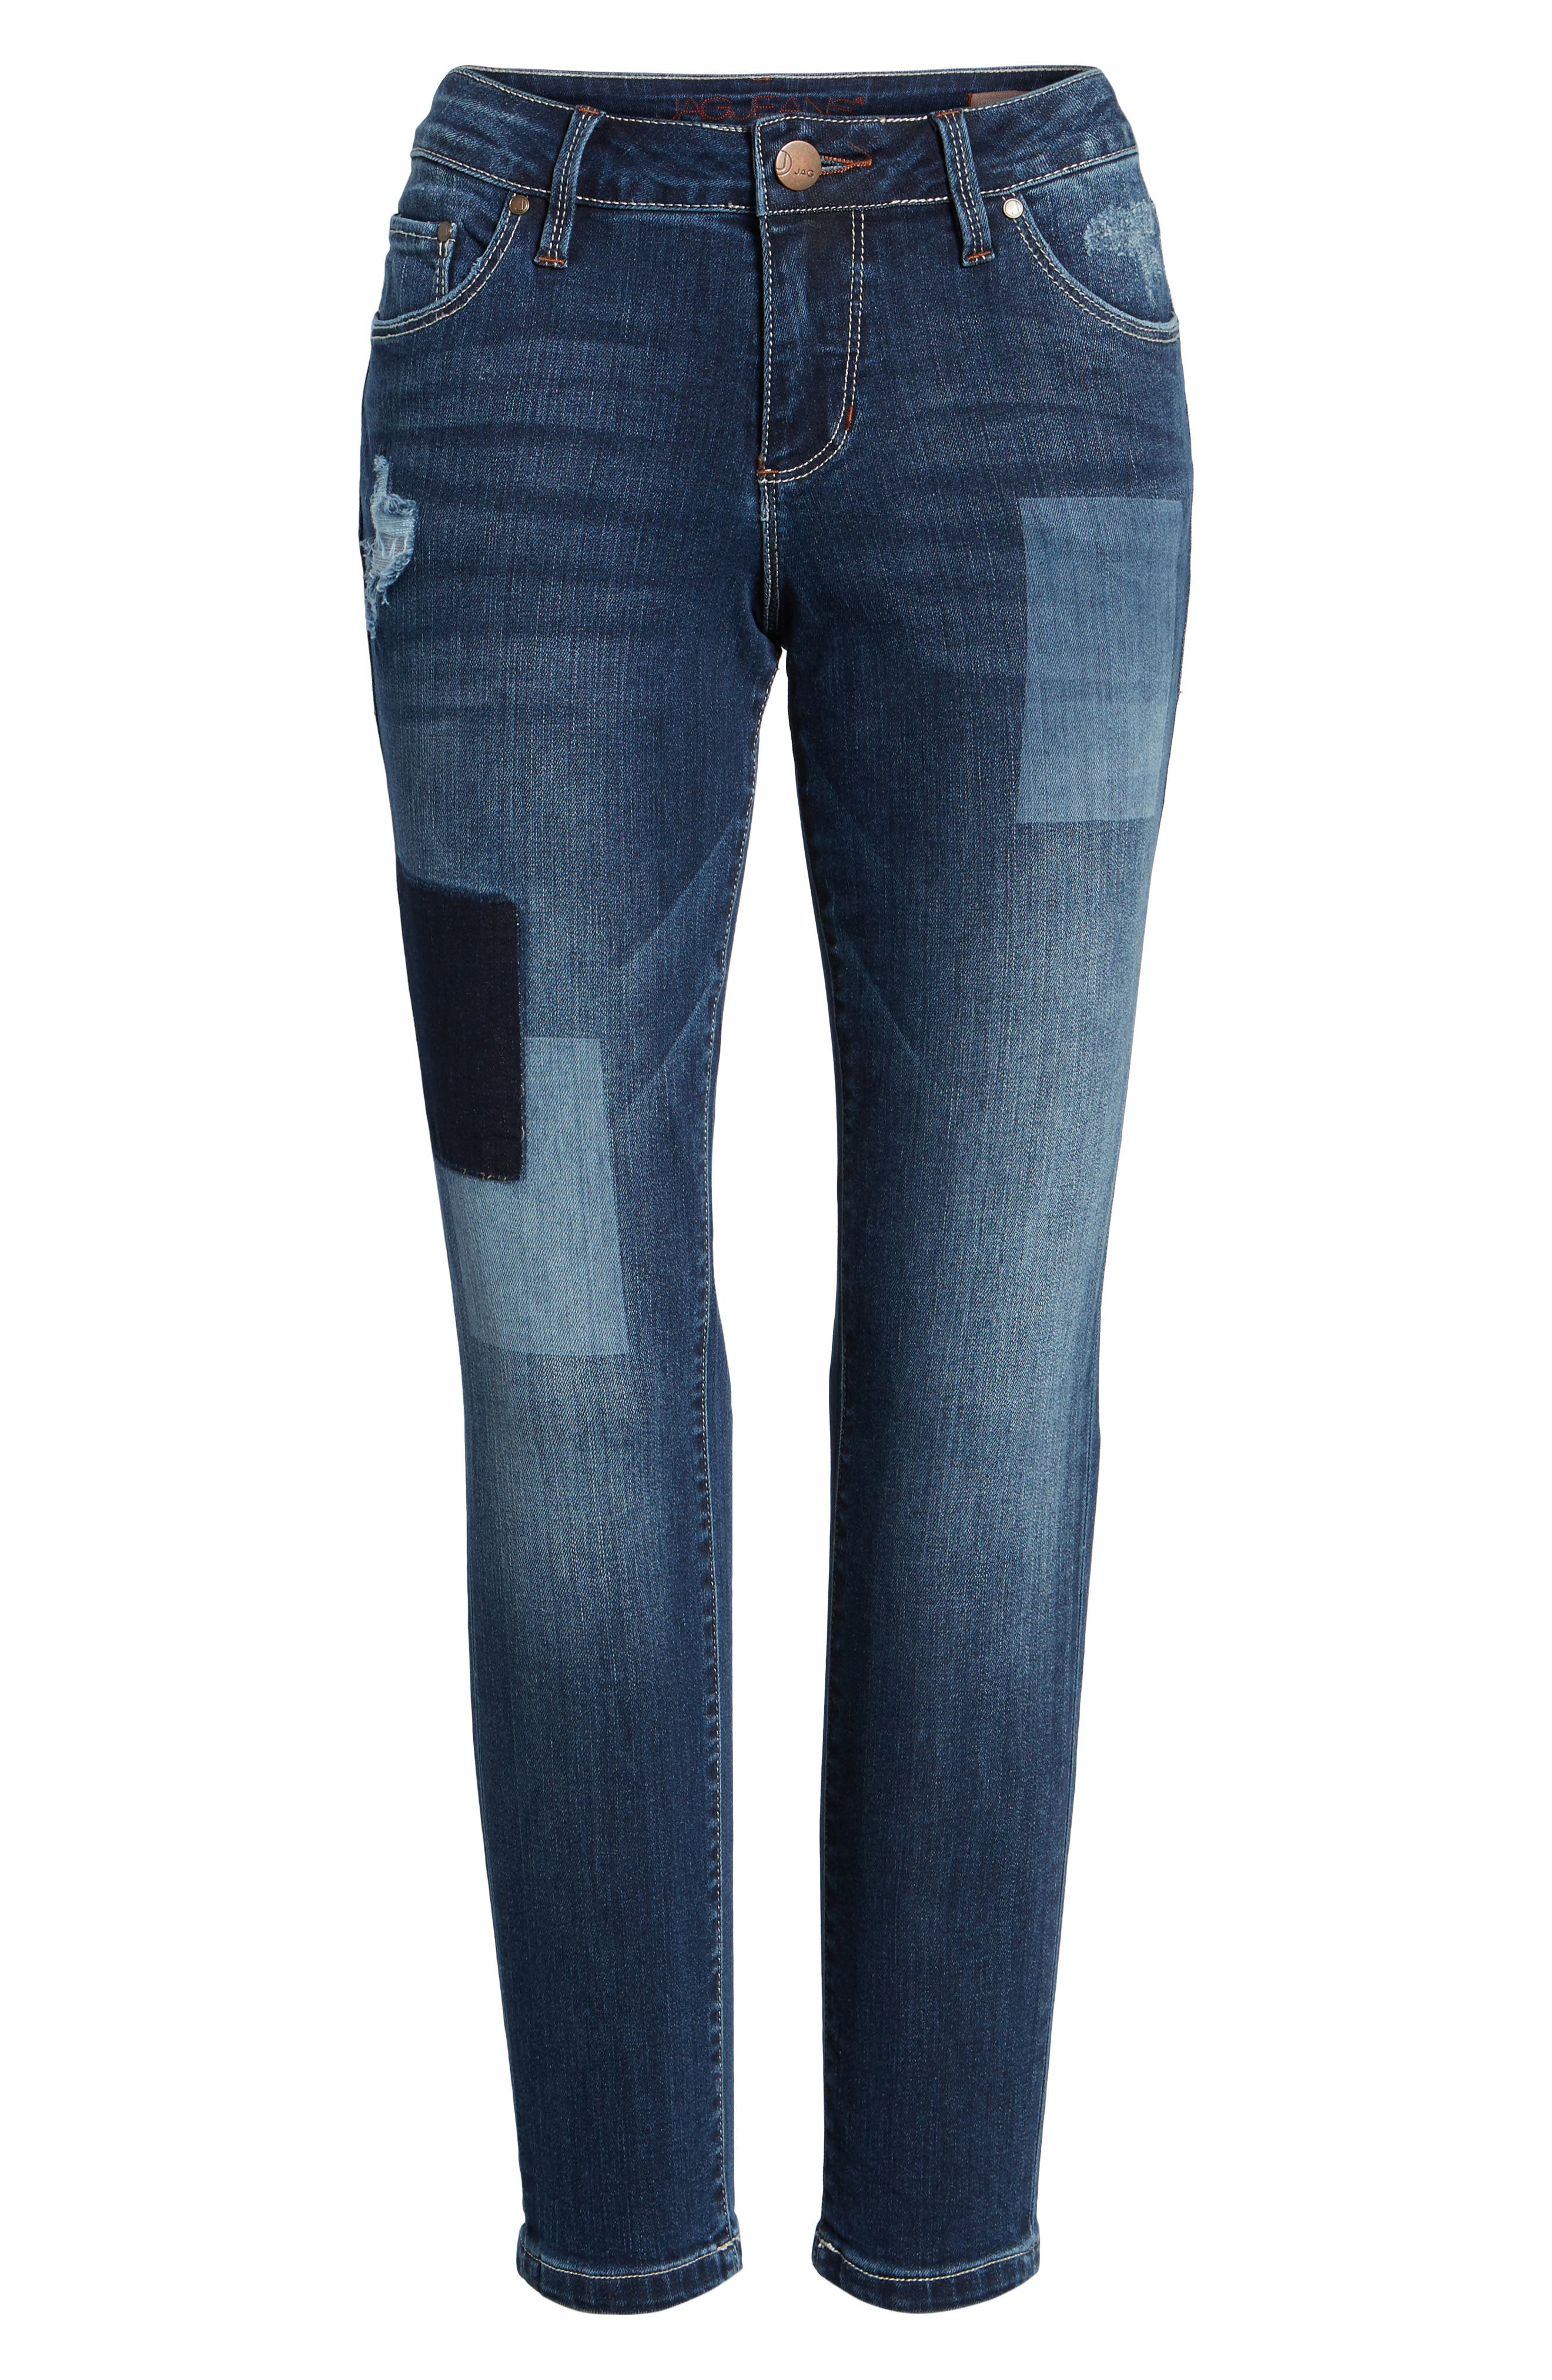 Main Image - Jag Jeans Mera Skinny Ankle Jeans (Bucket Blue)